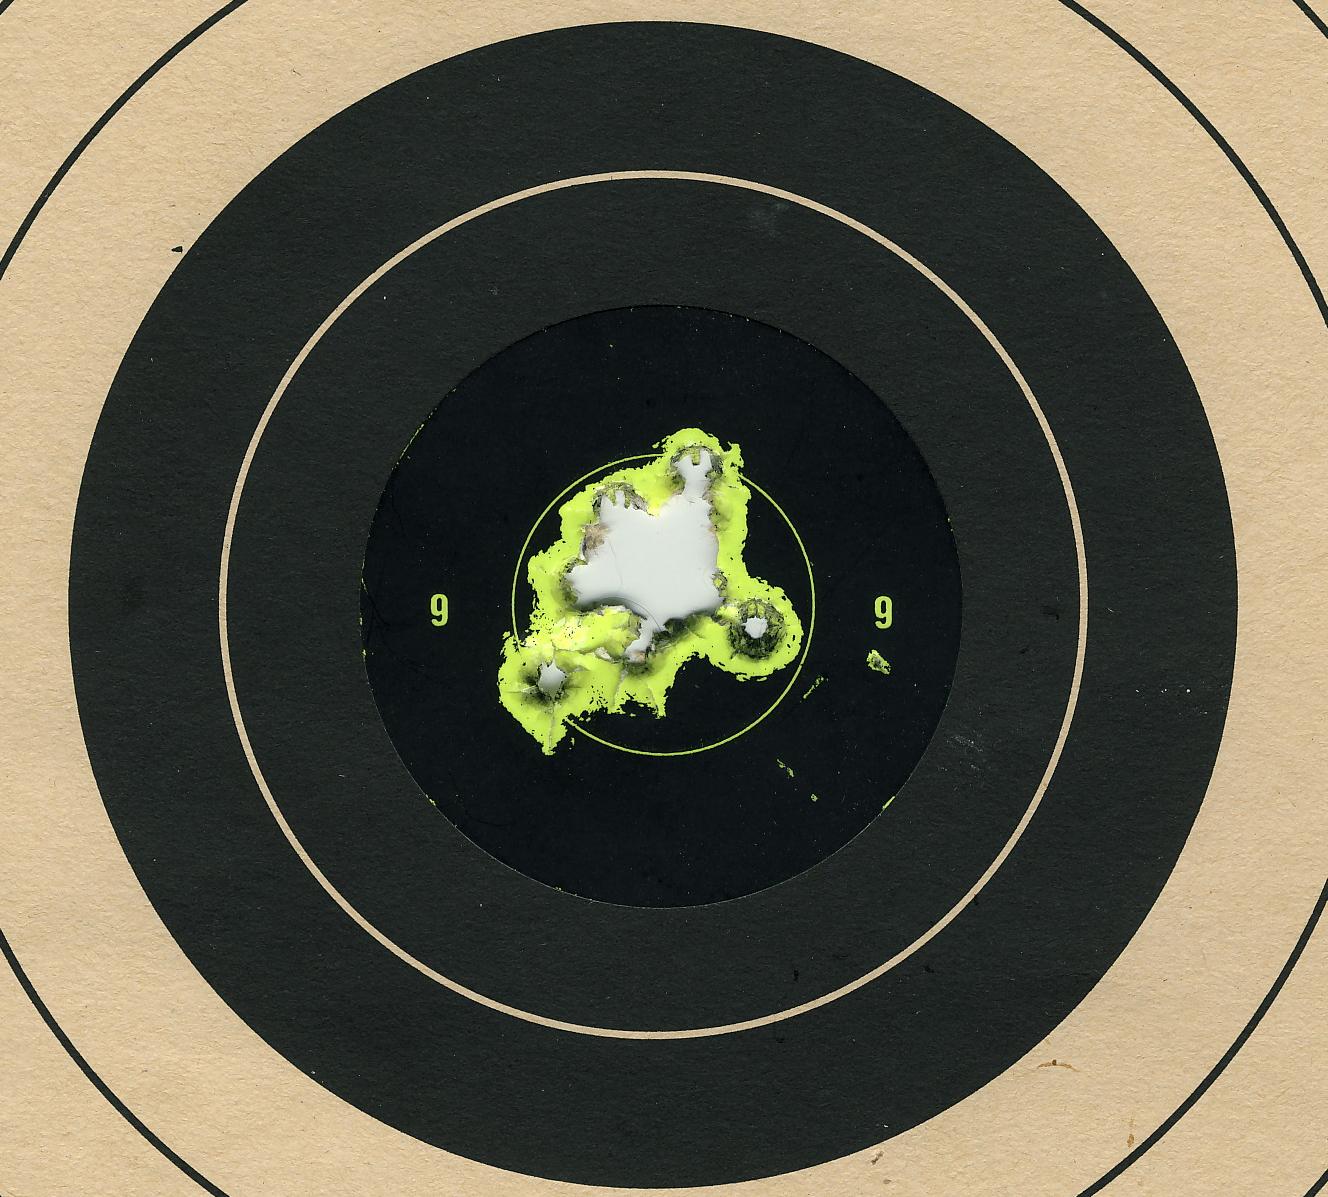 photograph regarding Free Printable Turkey Shoot Targets identify Taking pictures emphasis - Wikipedia